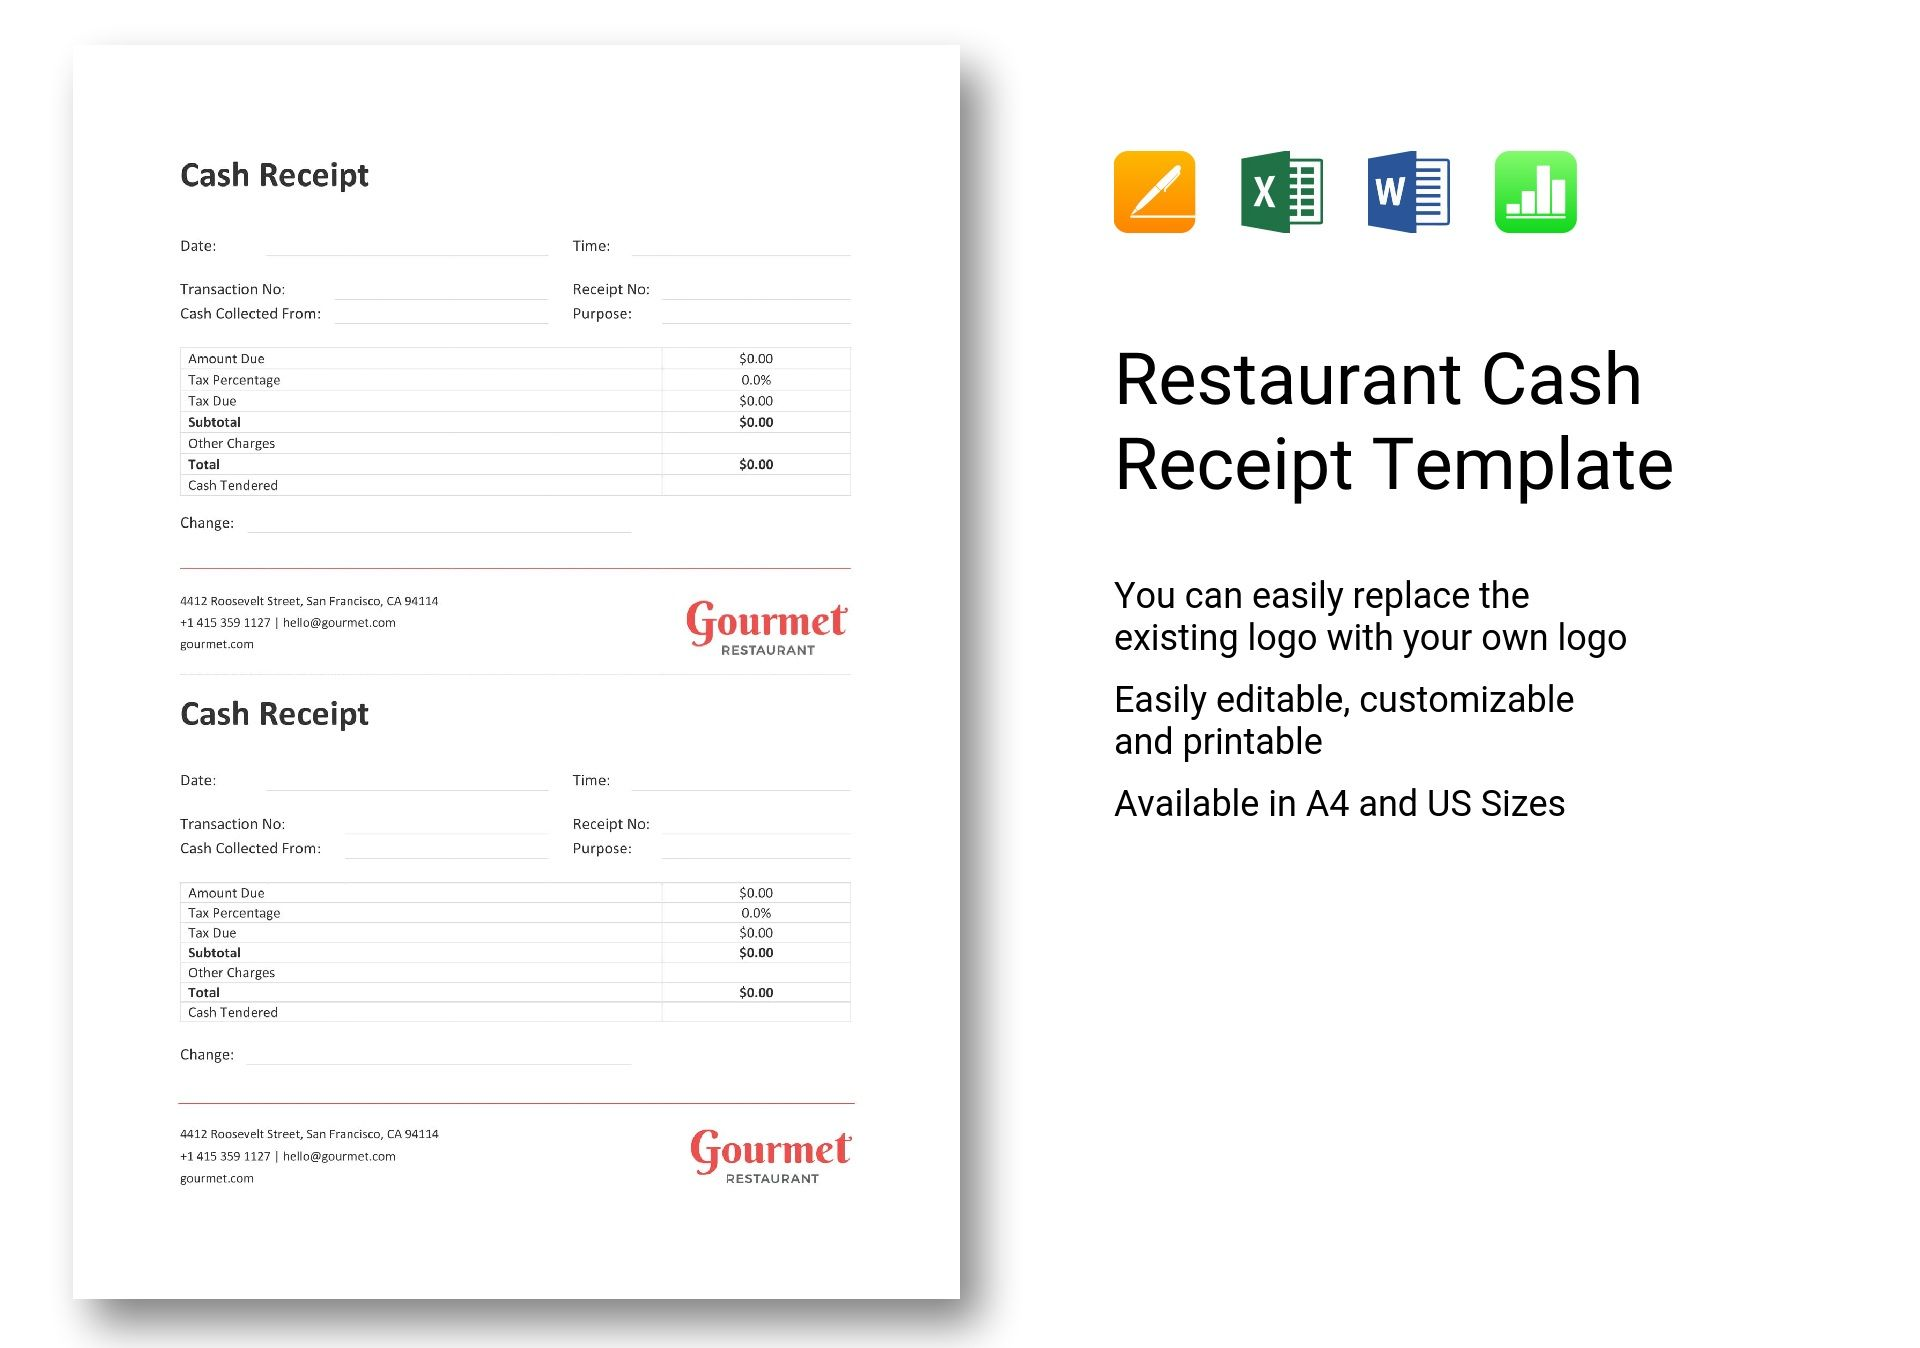 Restaurant Cash Receipt Template In Word Excel Apple